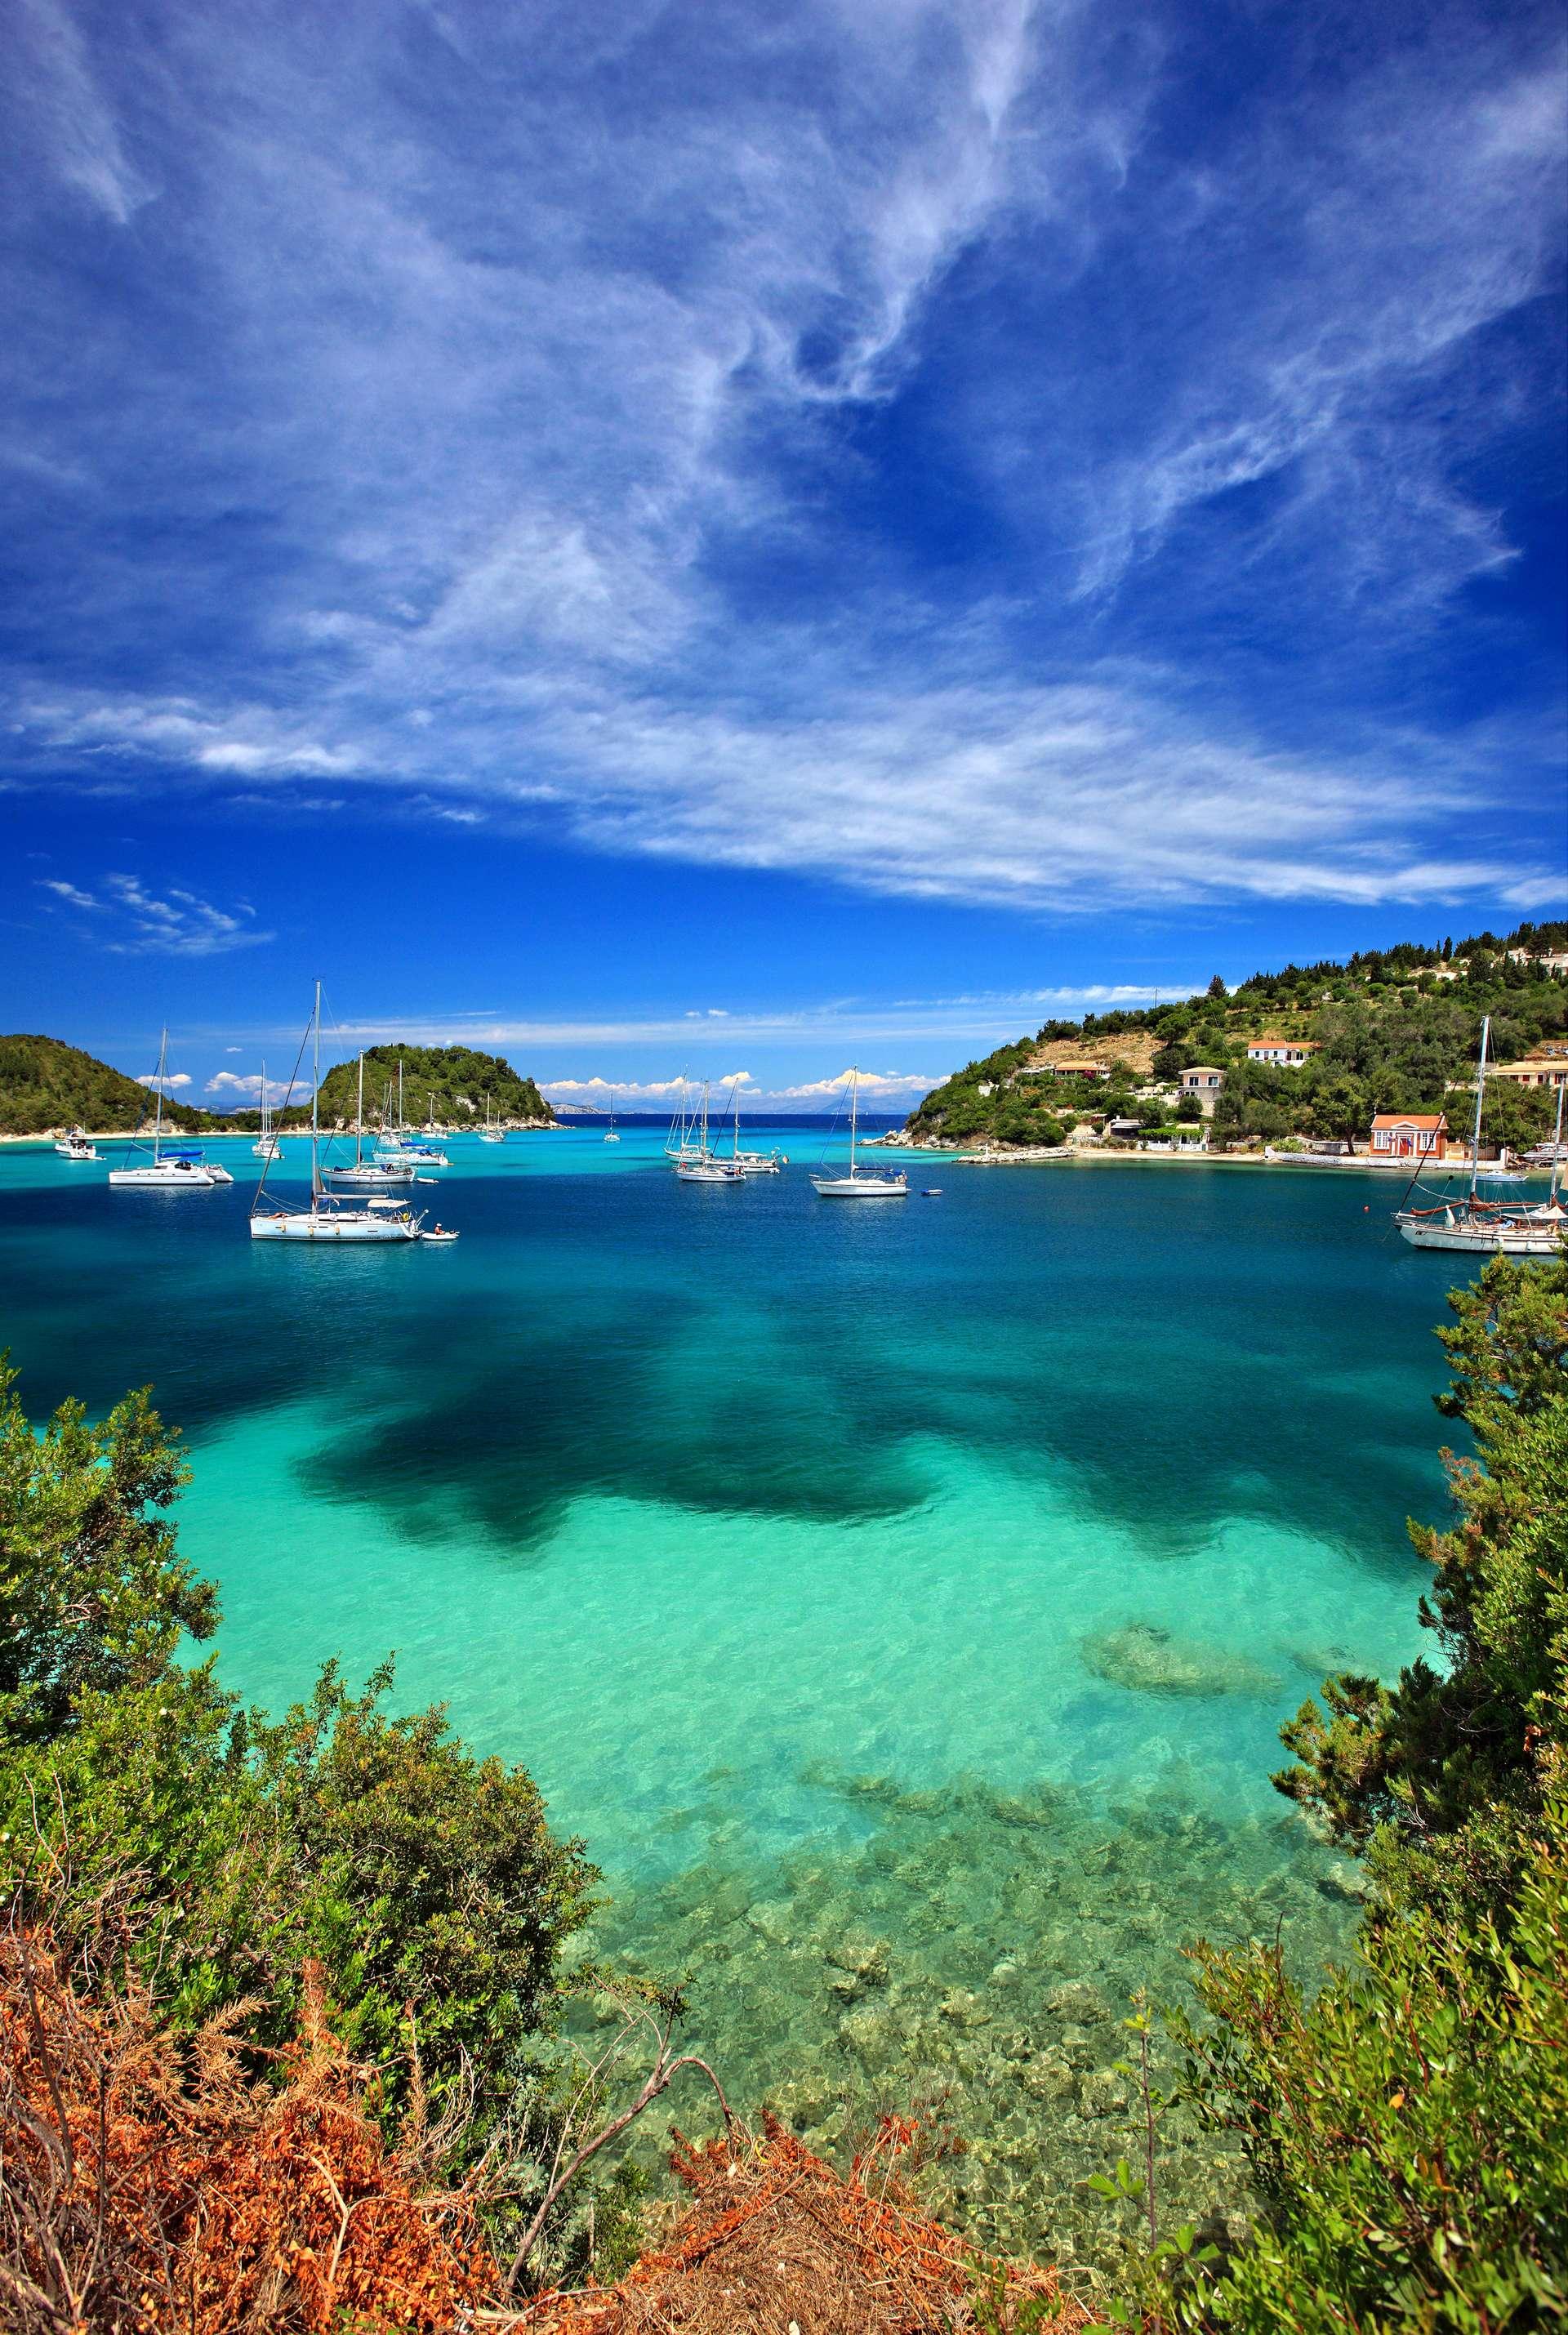 Griekenland Corfu Paxos Lakka bay and small part of Lakka village